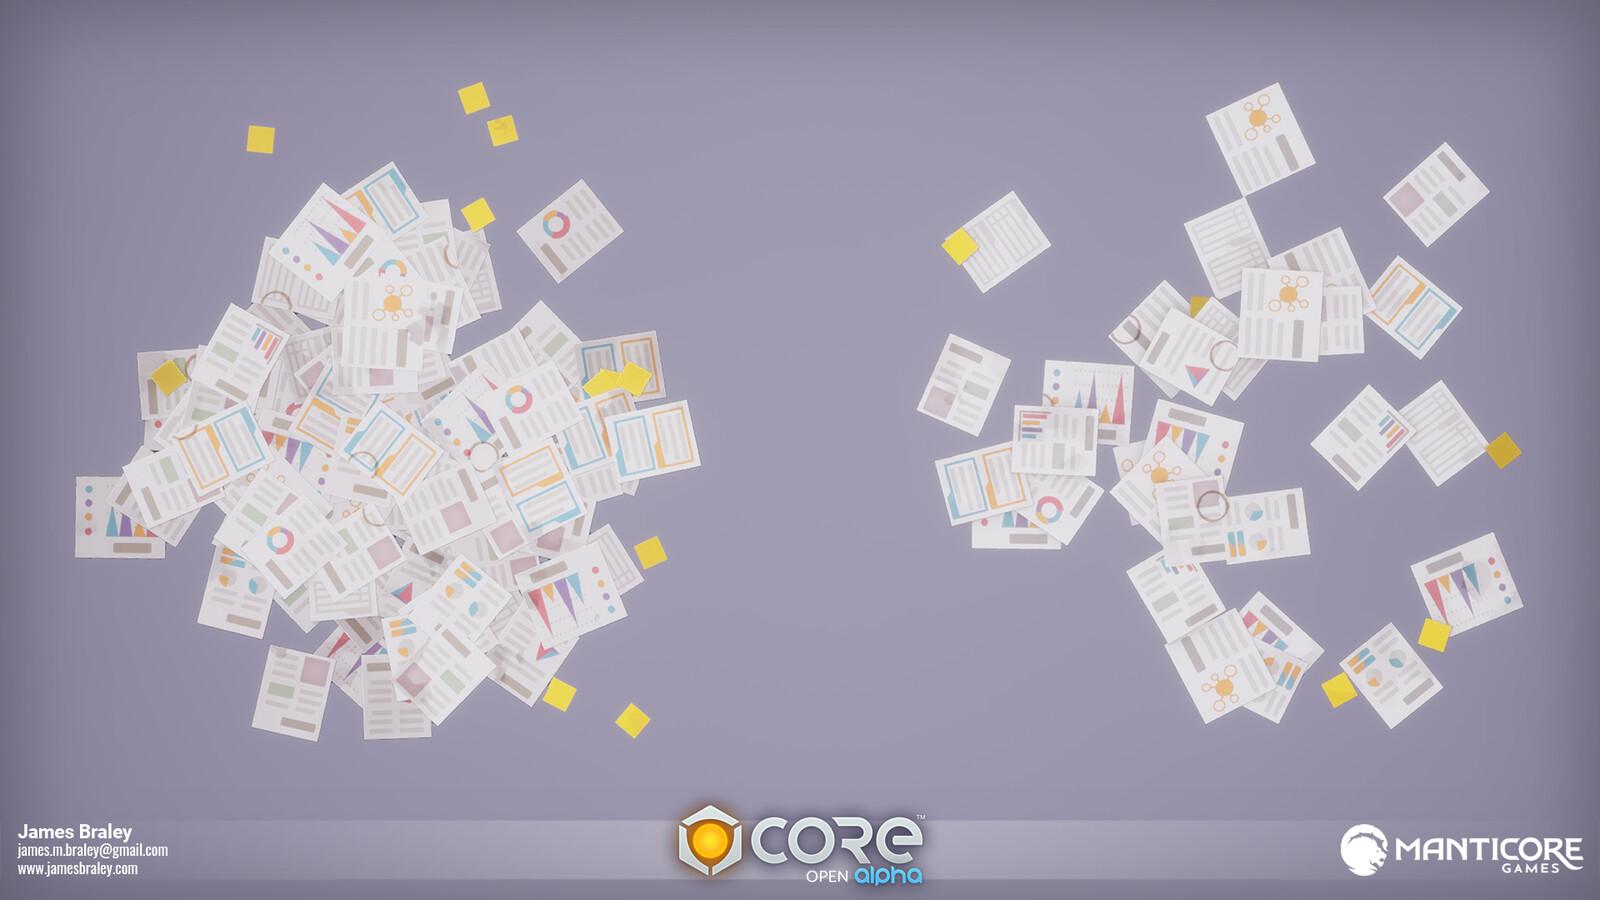 Office Floor Debris Decals (Concepts by Jordan Louie)